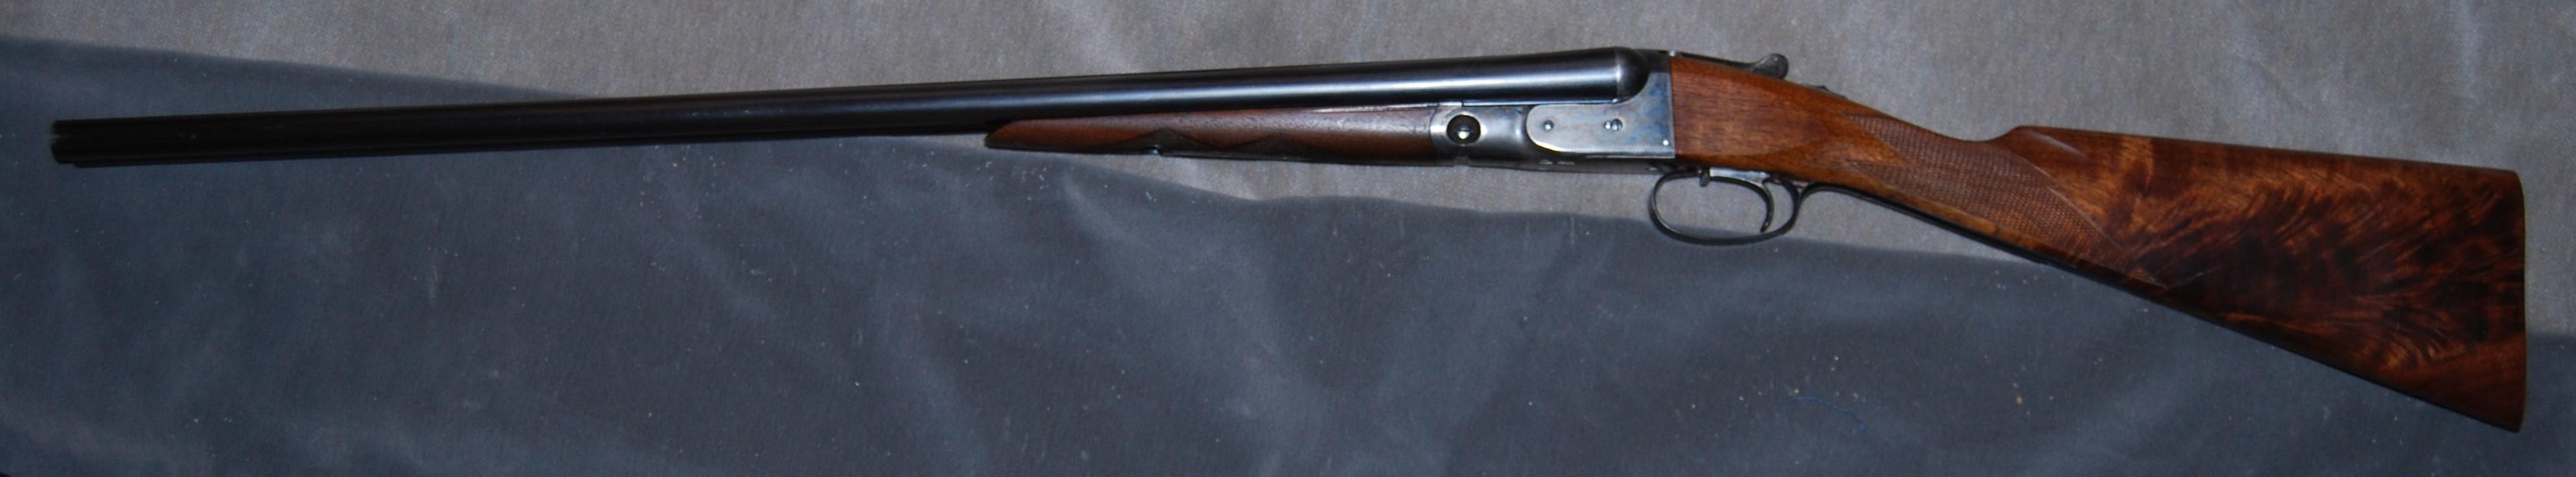 DSC_1362 (2).JPG